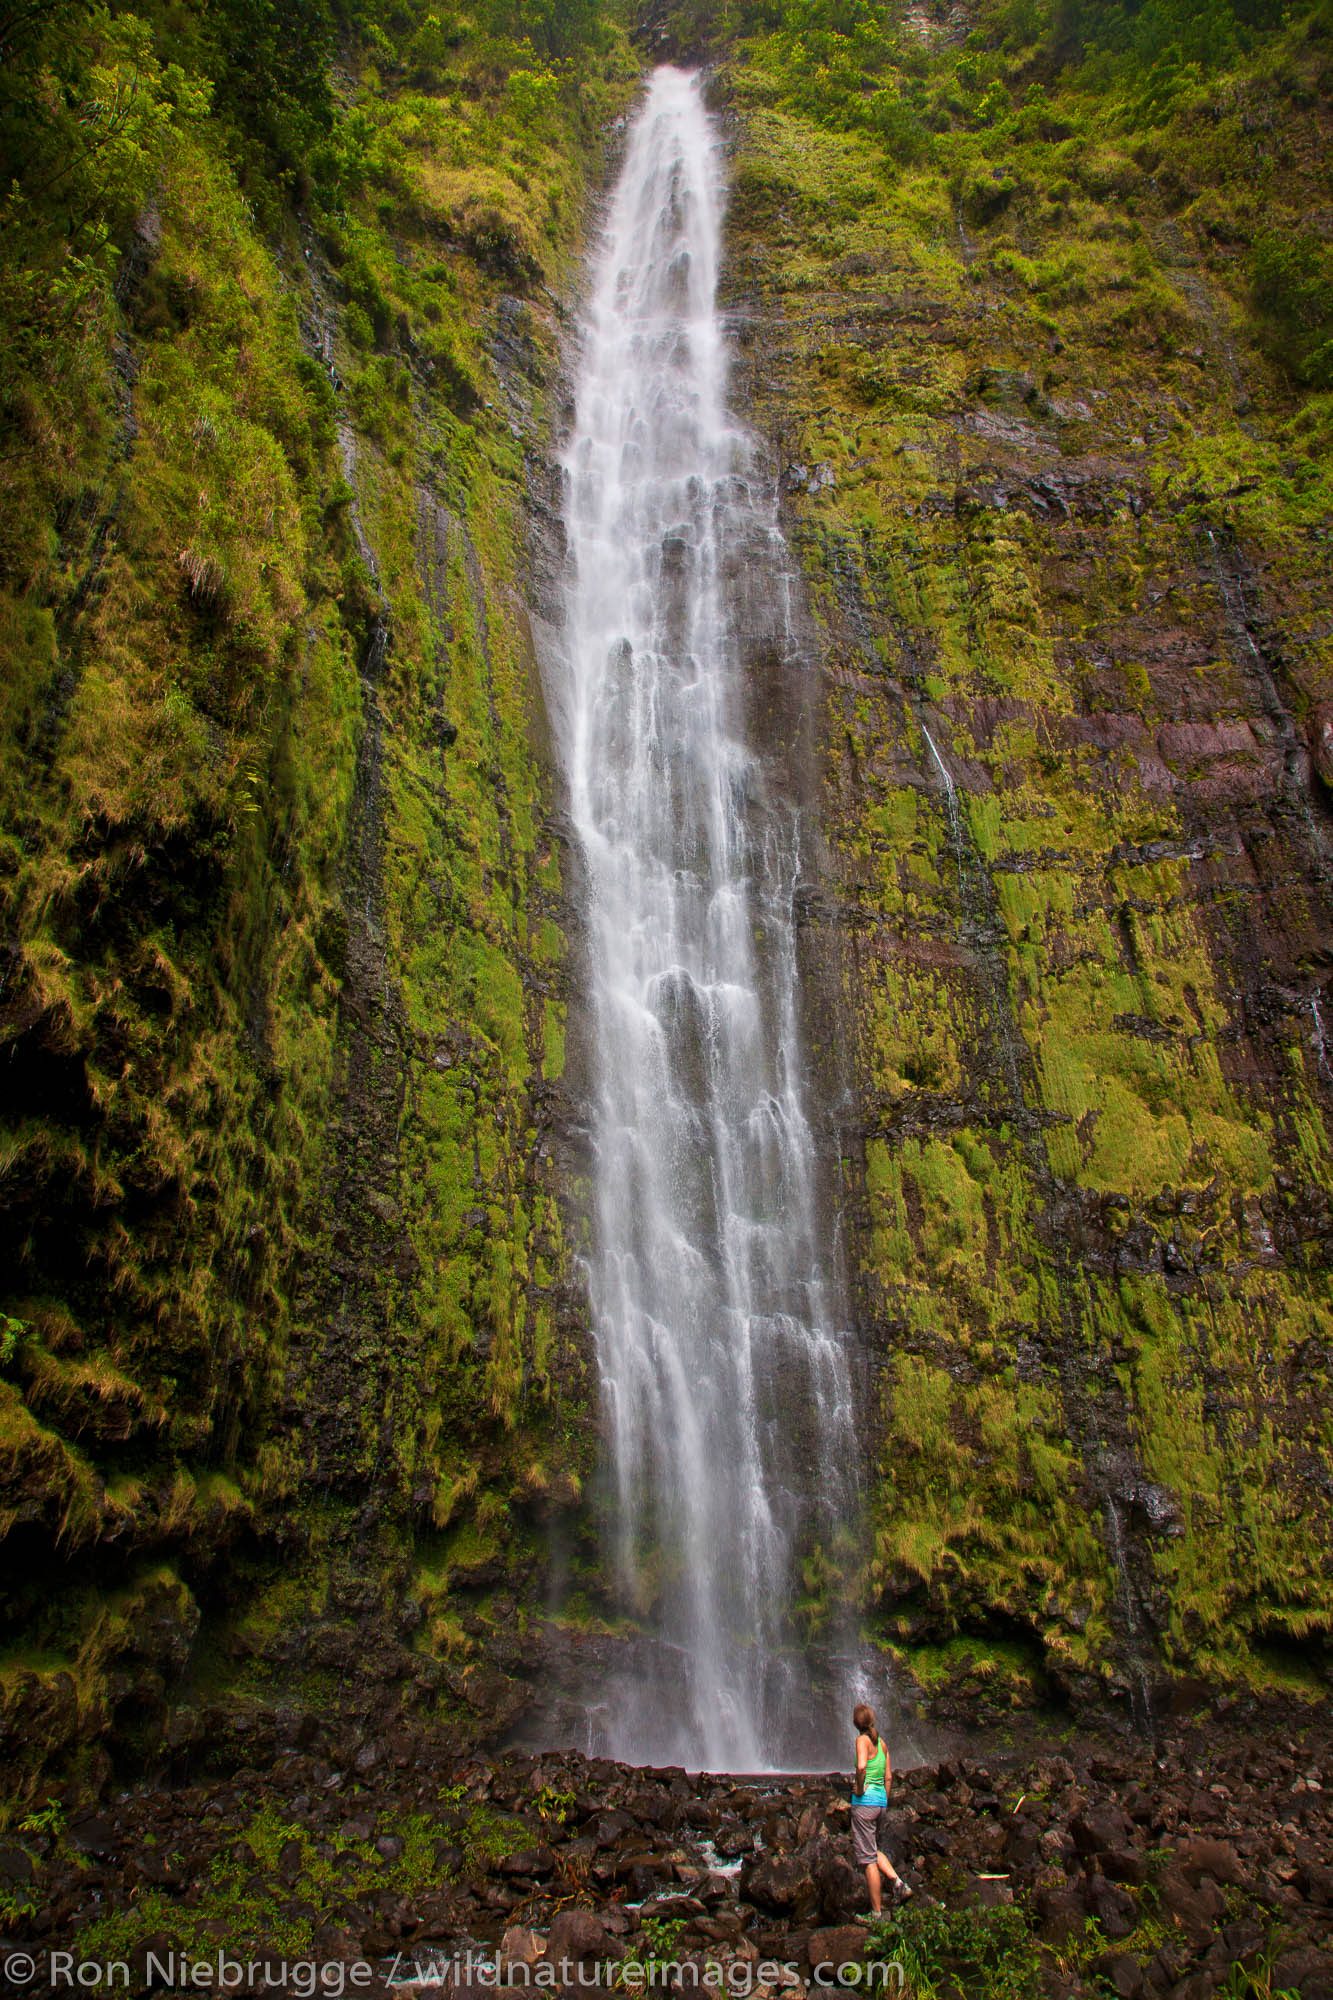 Hiker at Waimoku Falls at the end of the Pipiwai Trail above the Ohe'o Gulch - aka Seven Sacred Pools, Haleakala National Park...